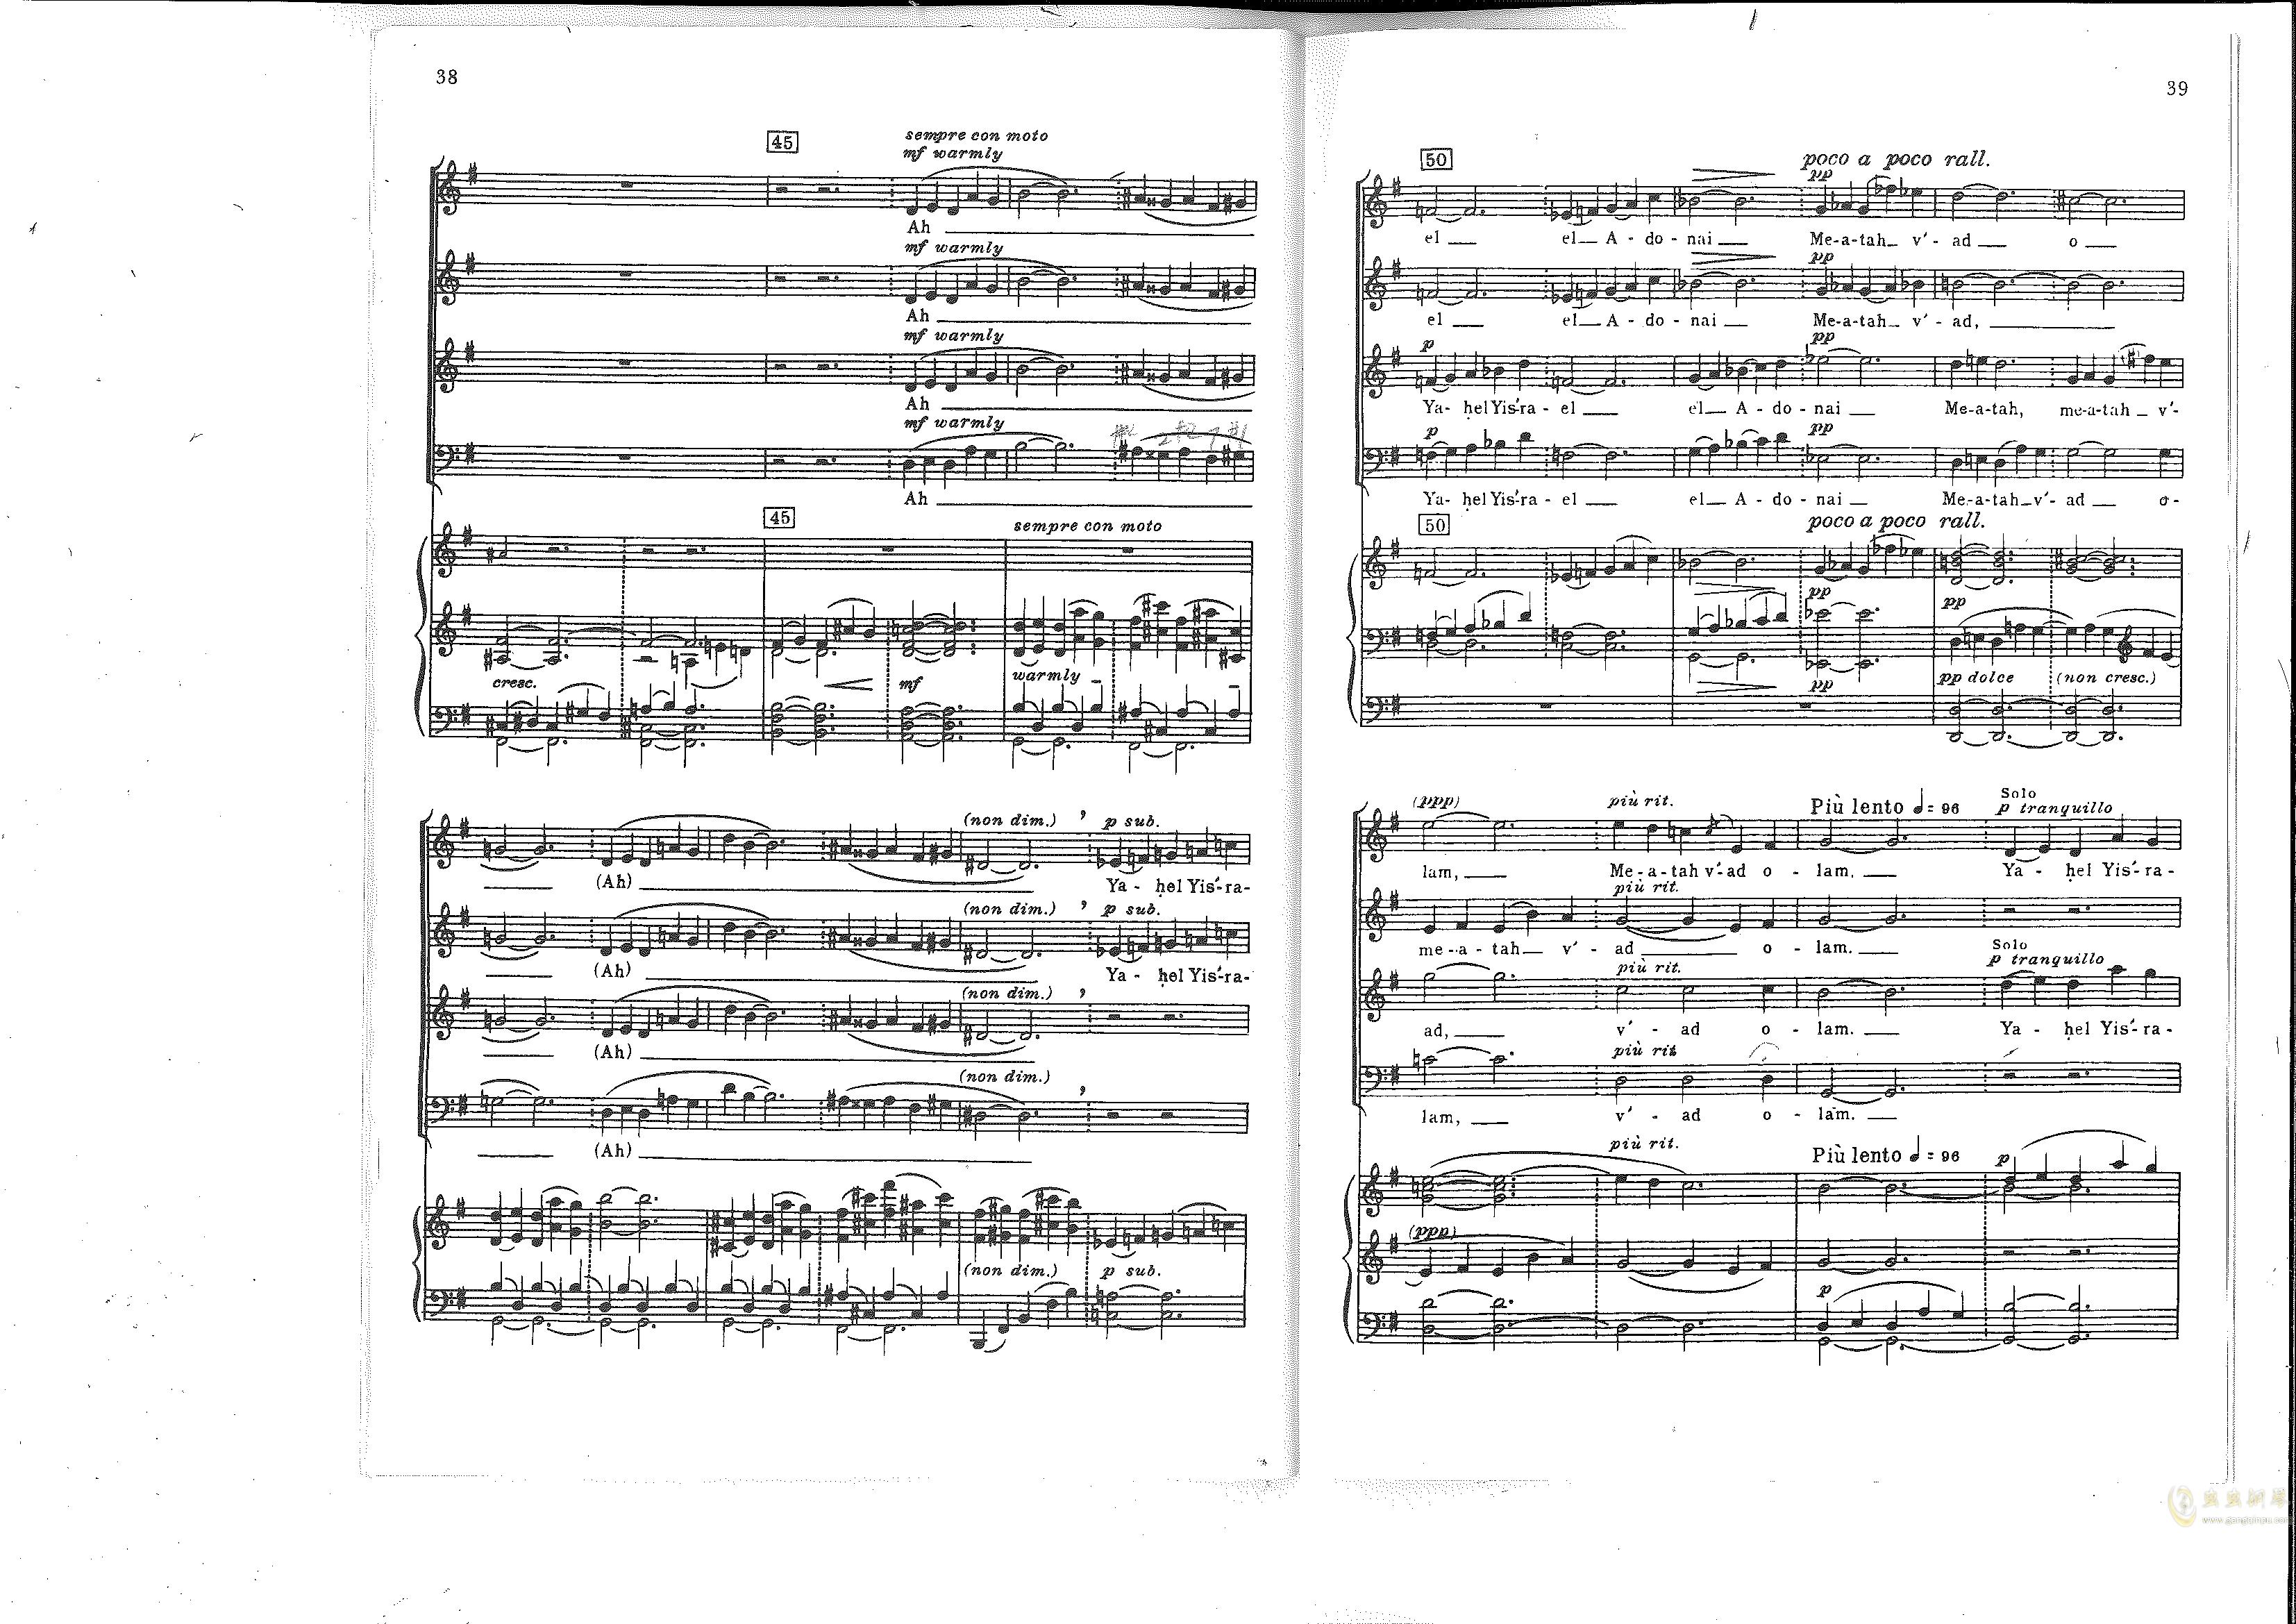 Chichester Psalms澳门星际官网 第23页